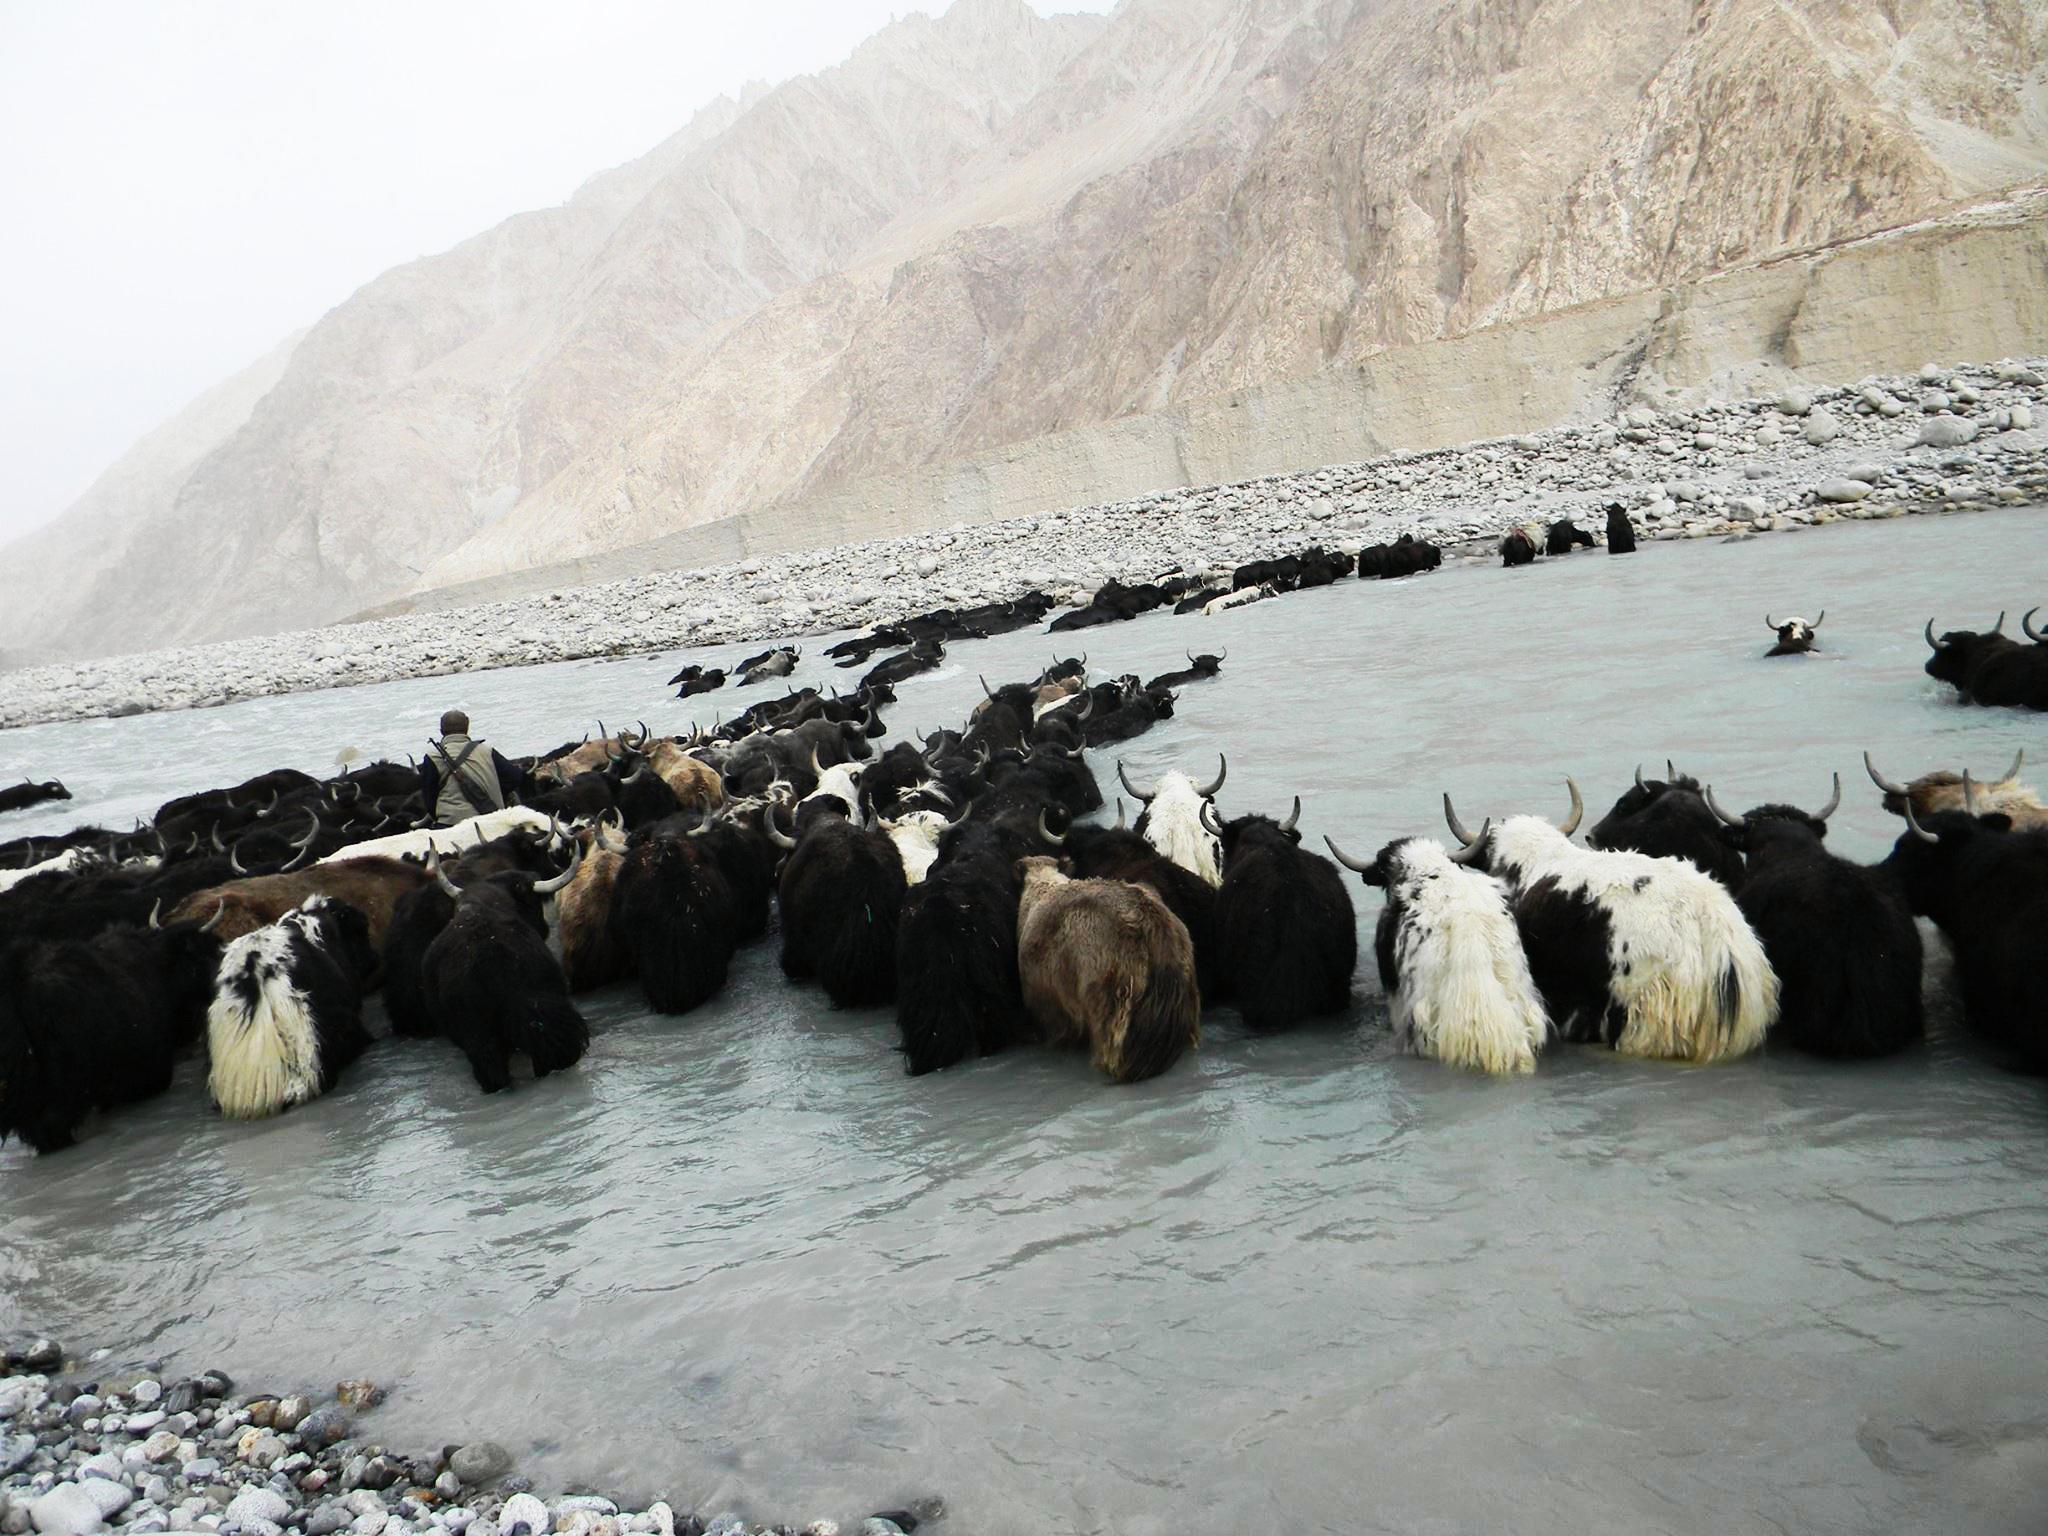 Crossing the Shimhsal River